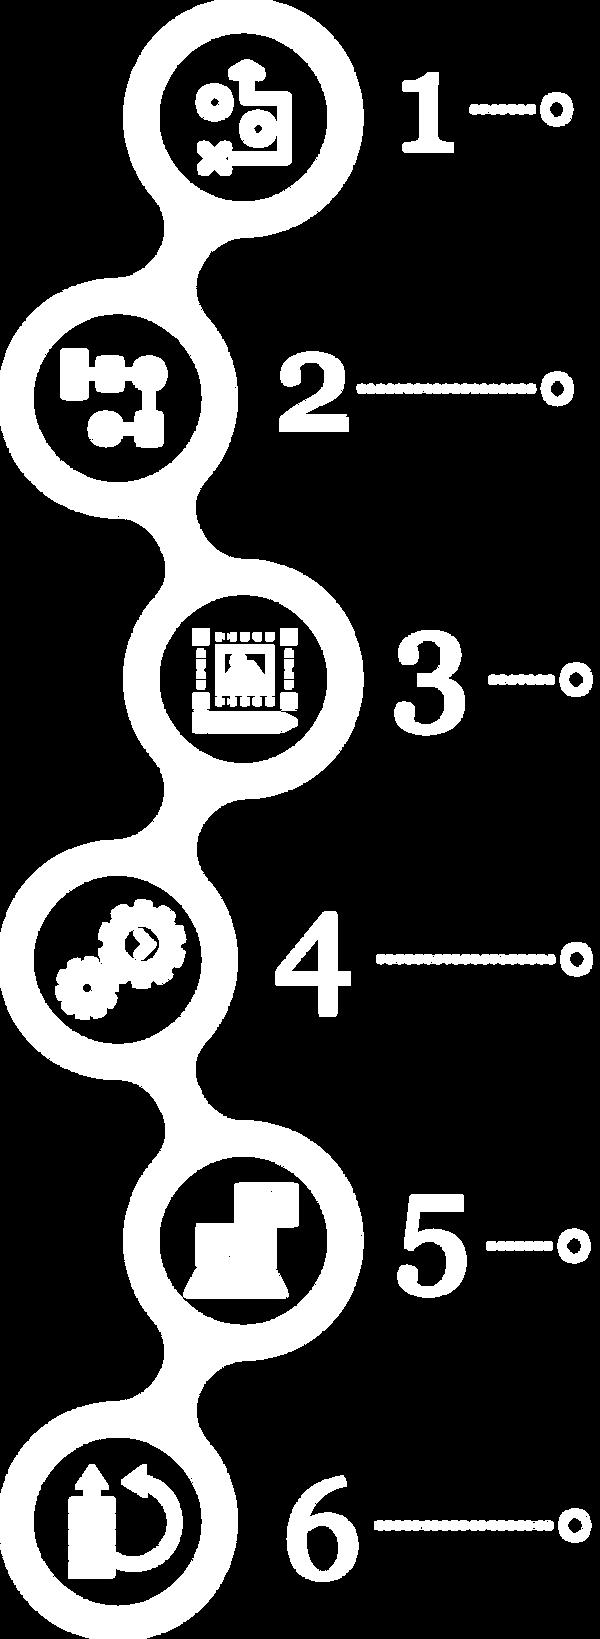 six_step_process.png